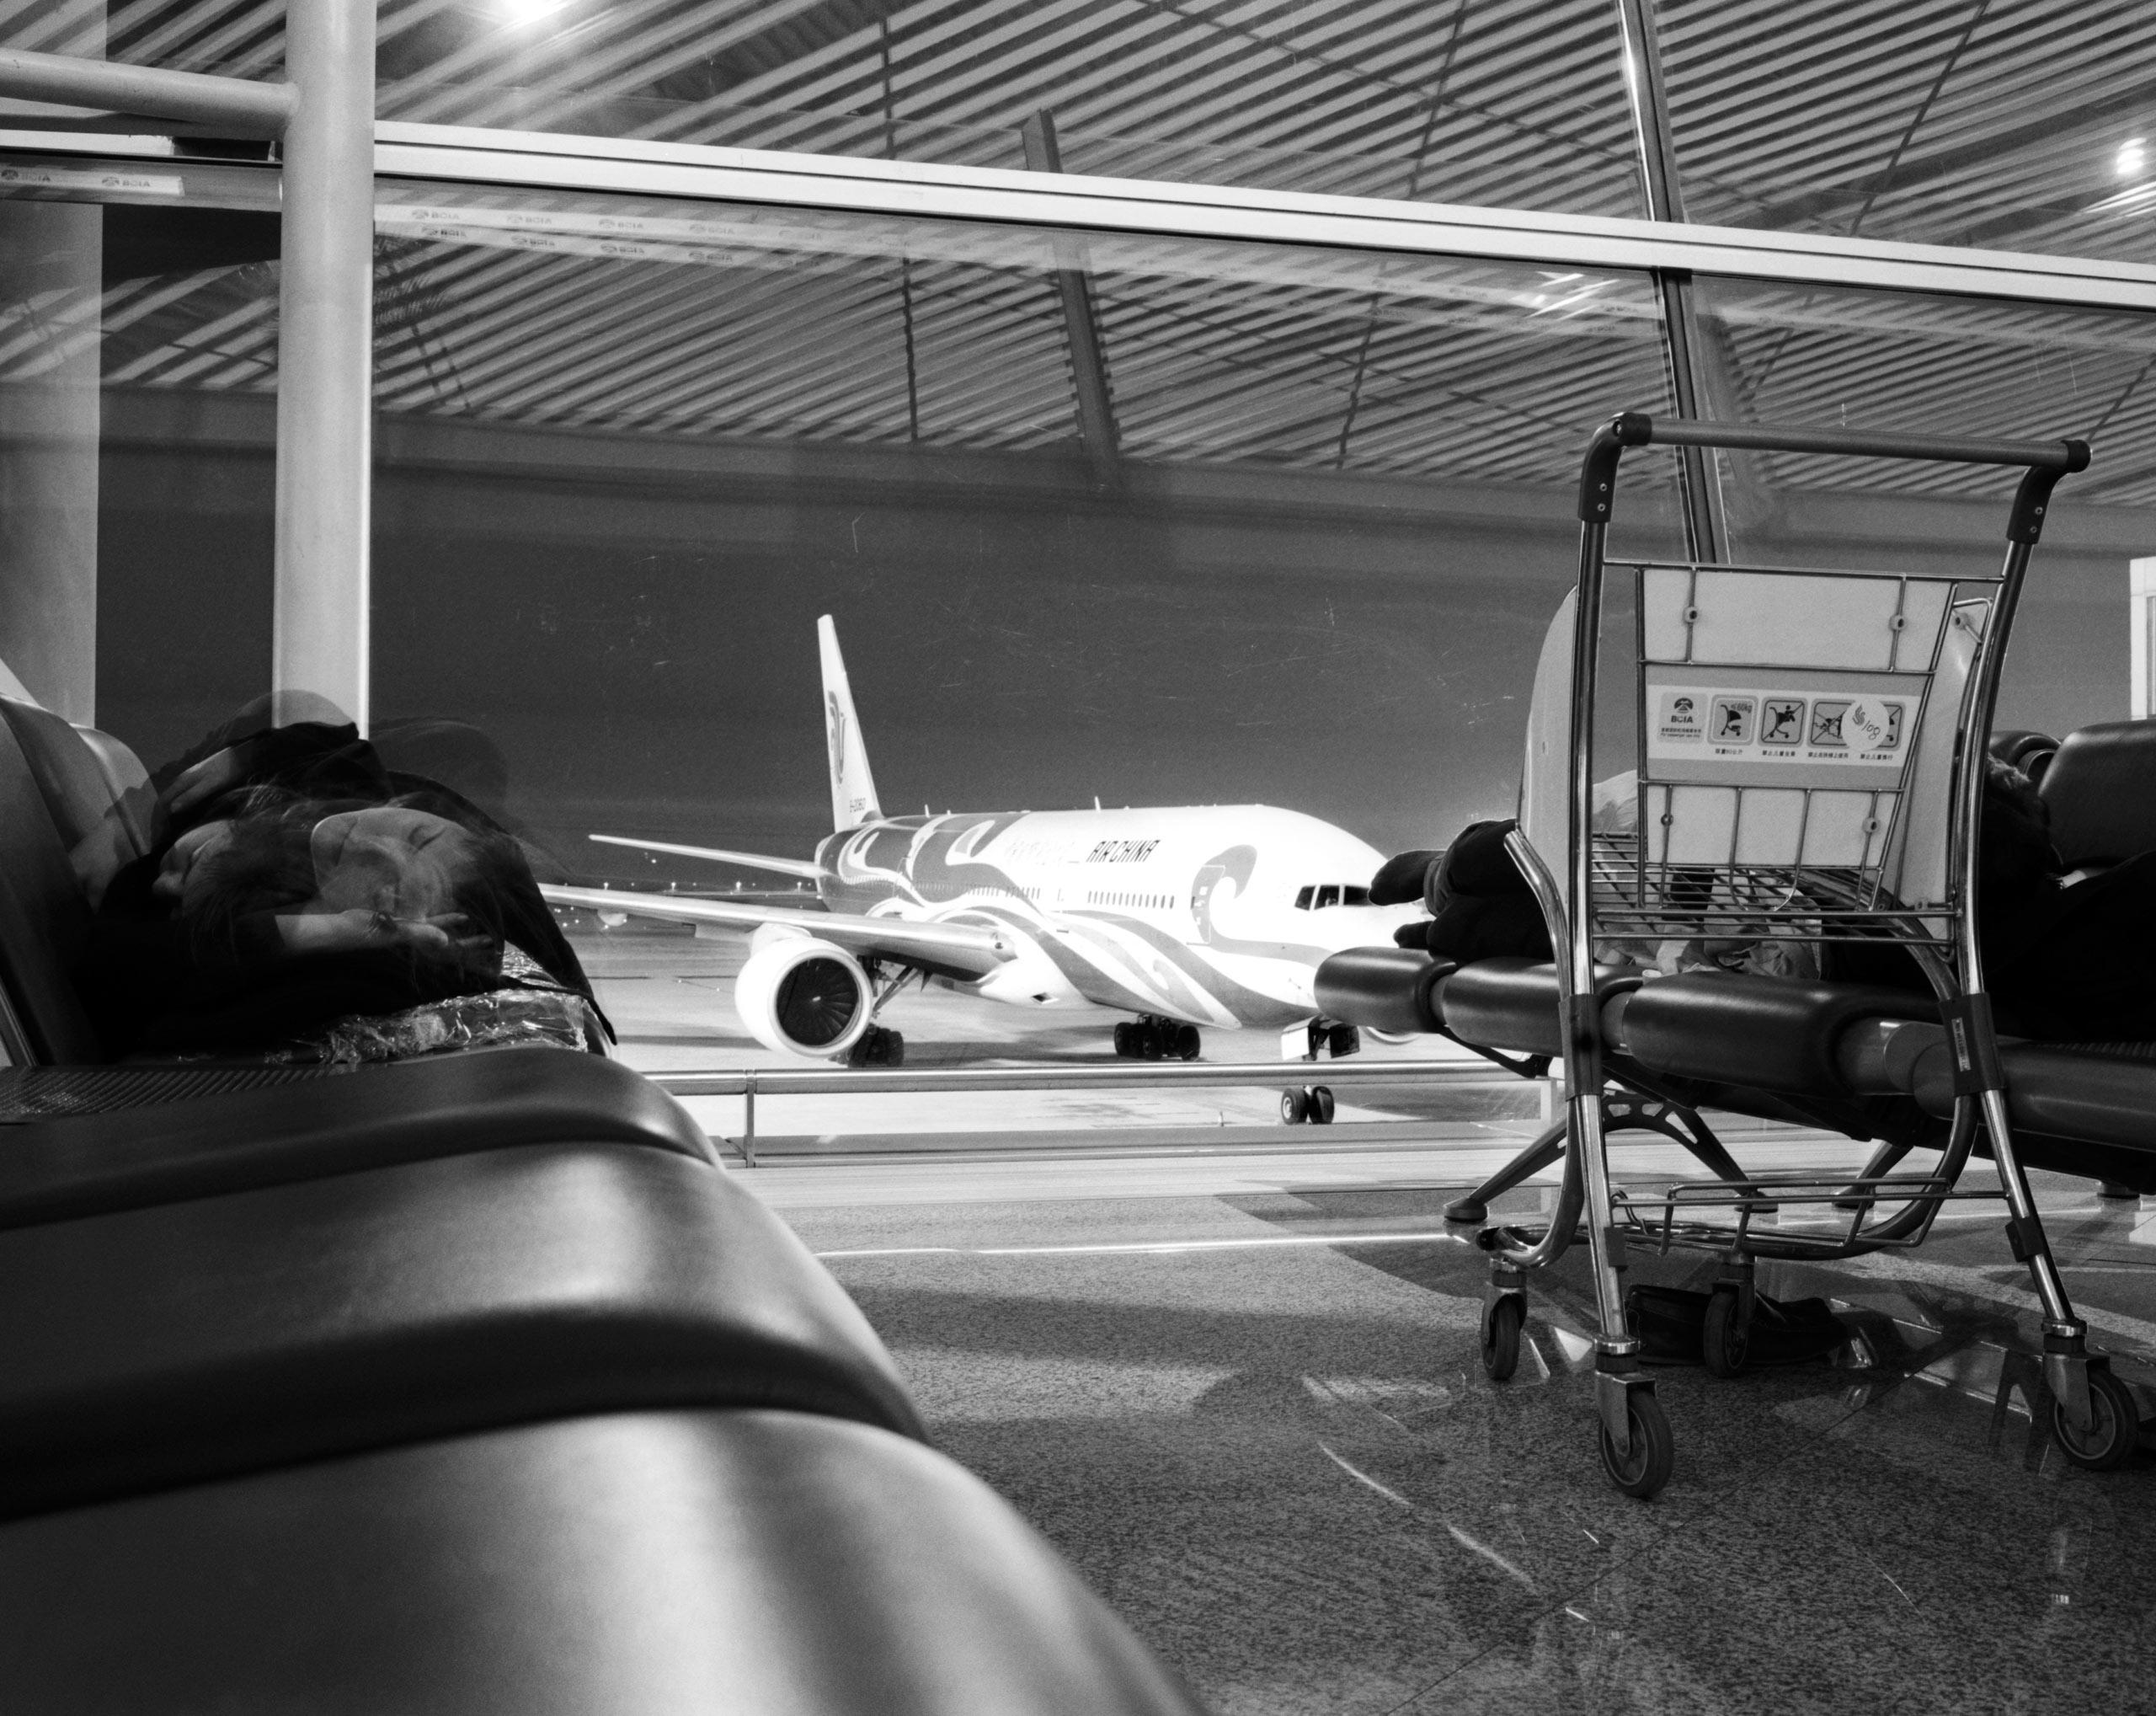 Beijing Capital International Airport, Beijing, China, 2011.